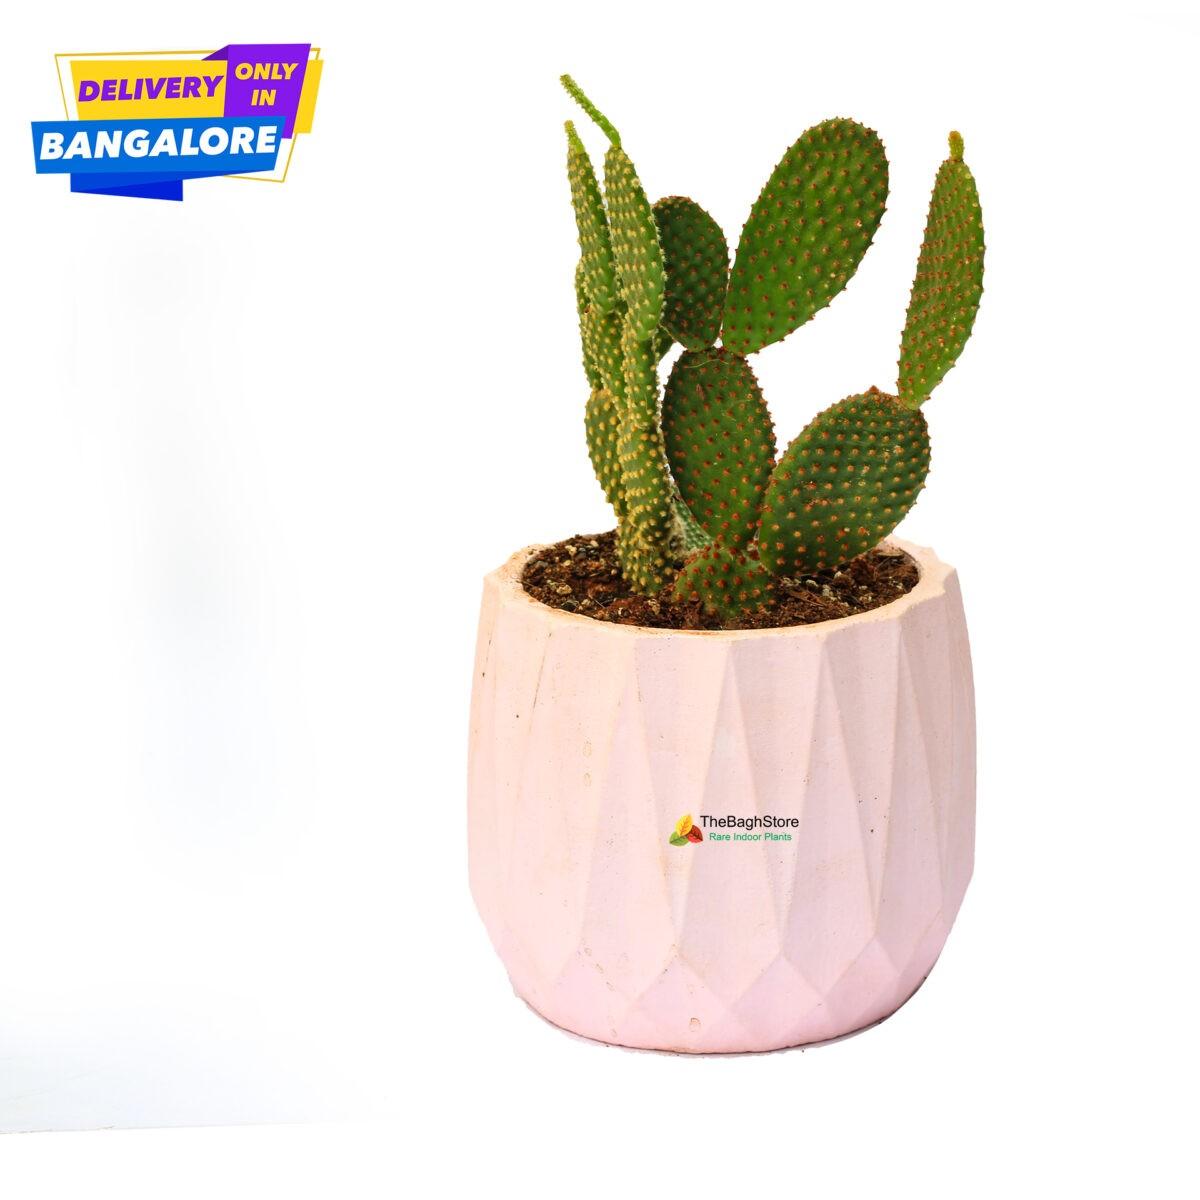 Bunny Ear Cactus in a pink concrete pot - Plant Nursery Bangalore